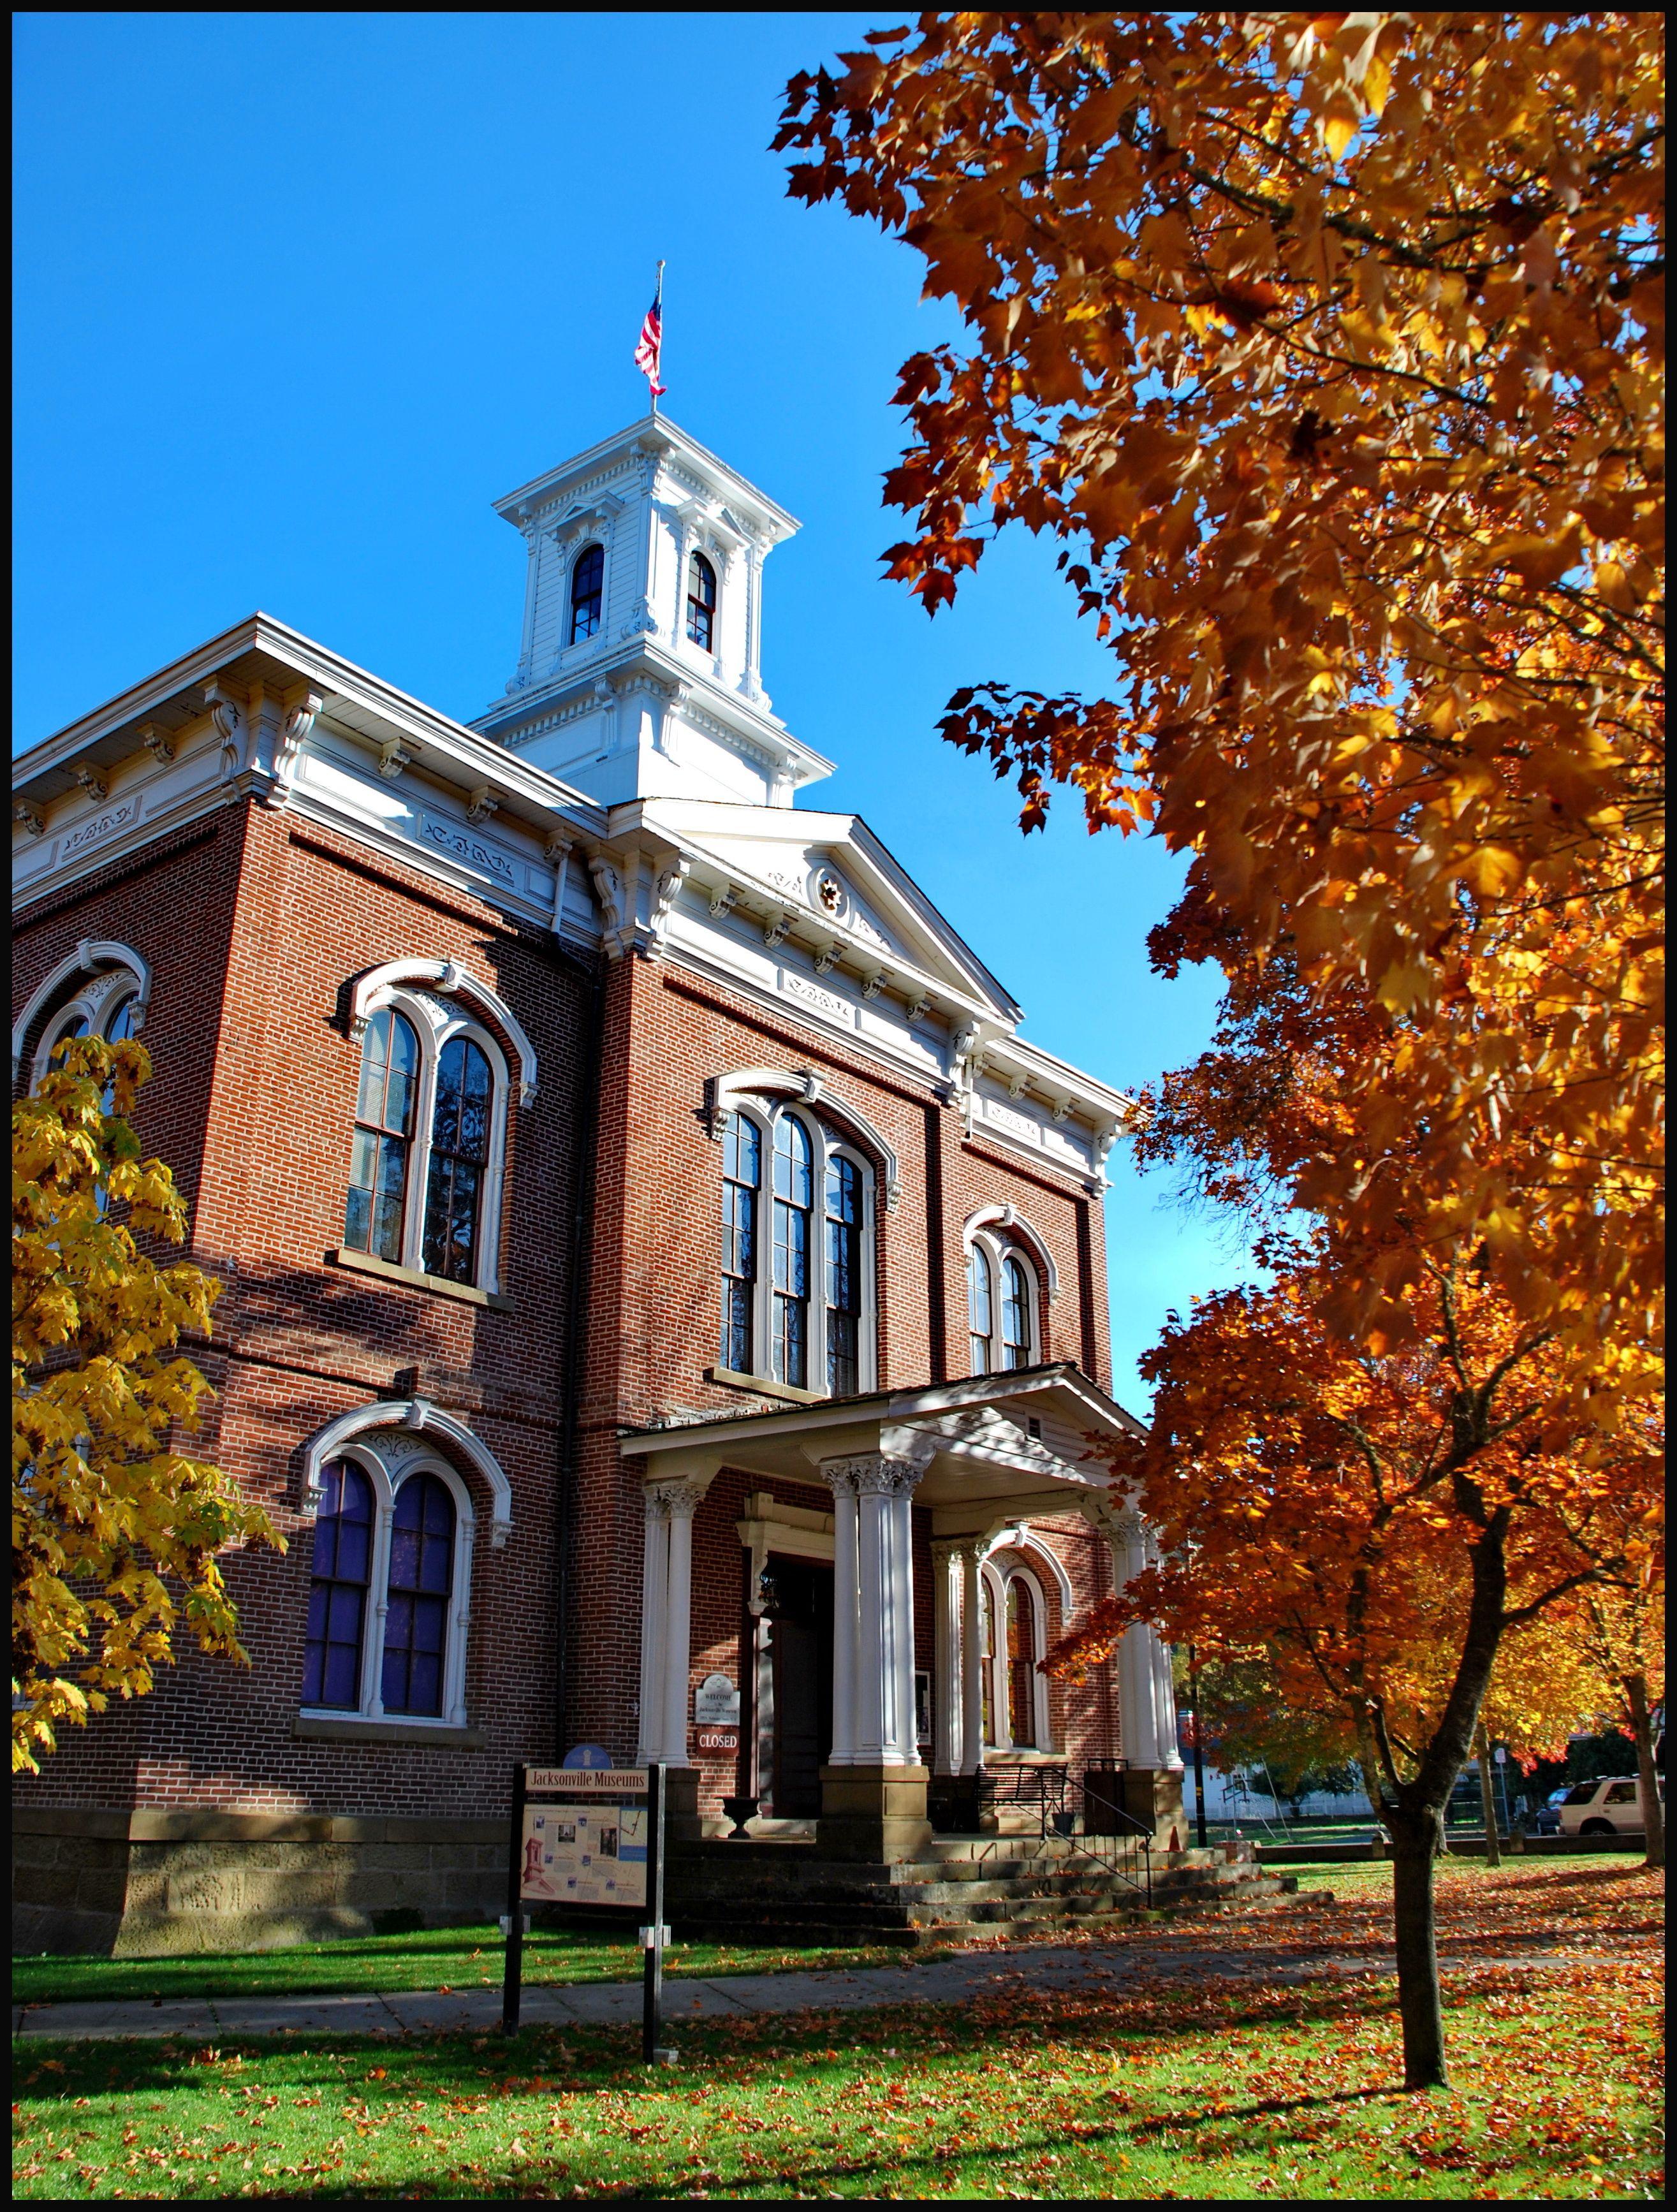 The historic original Jackson County Courthouse